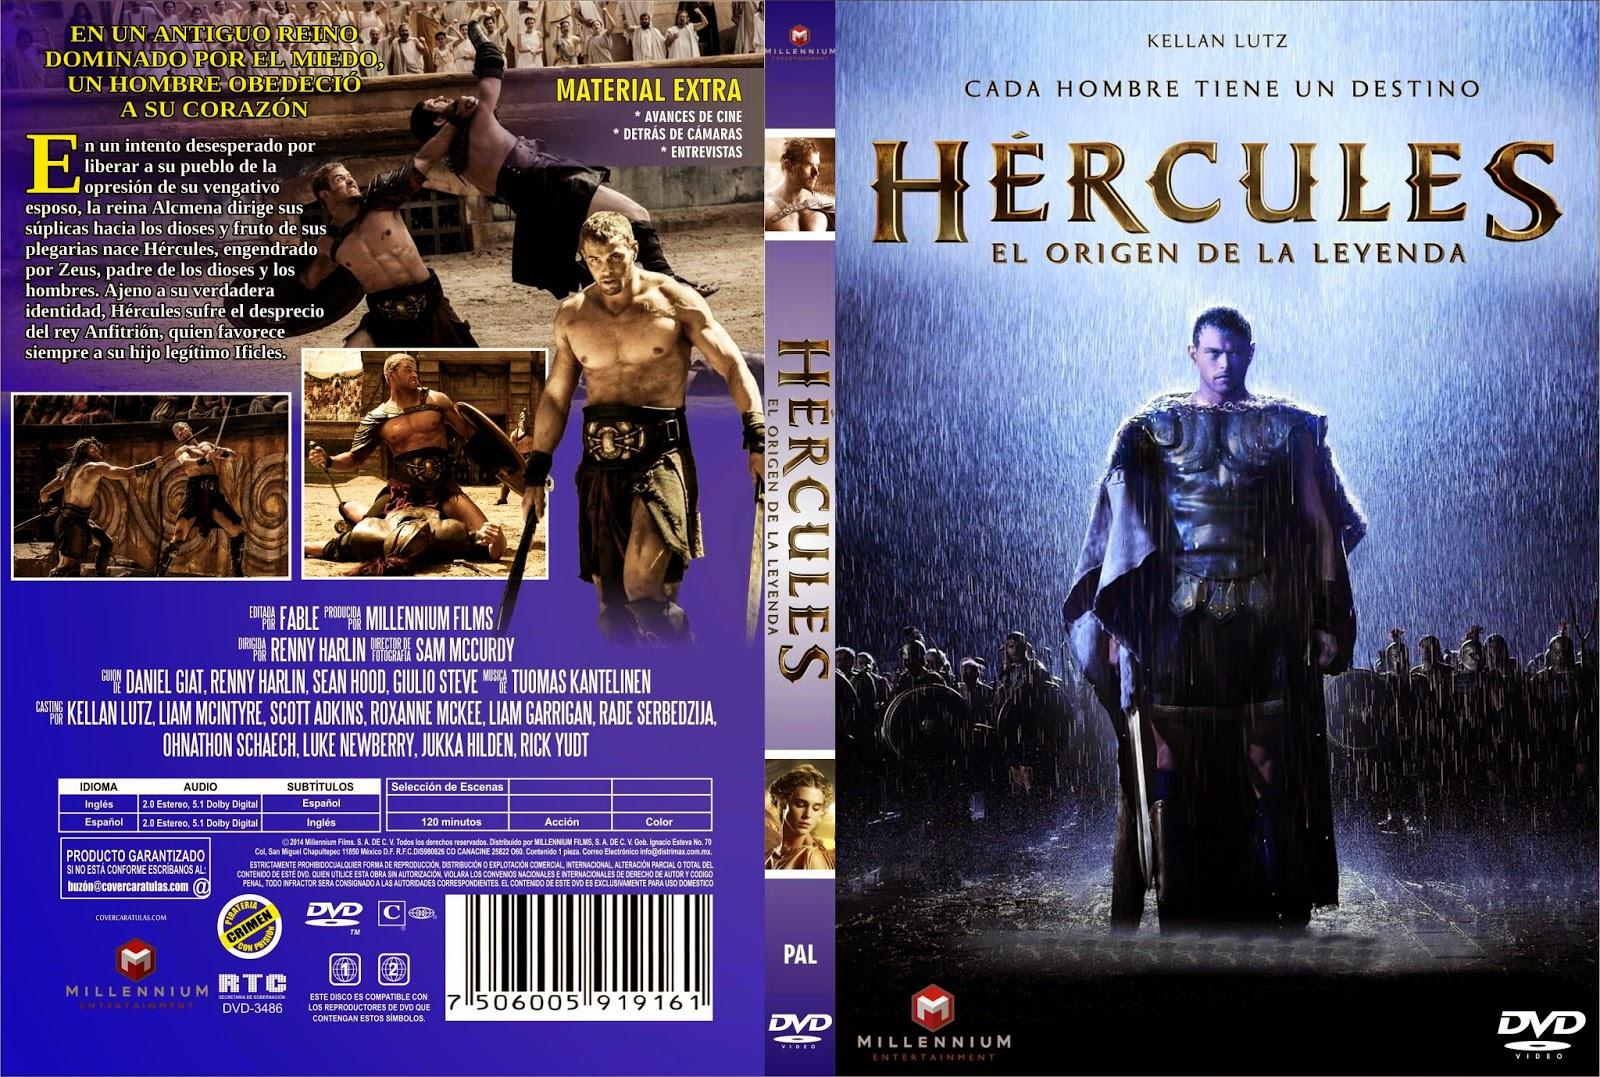 Hercules El Origen De La Leyenda DVD